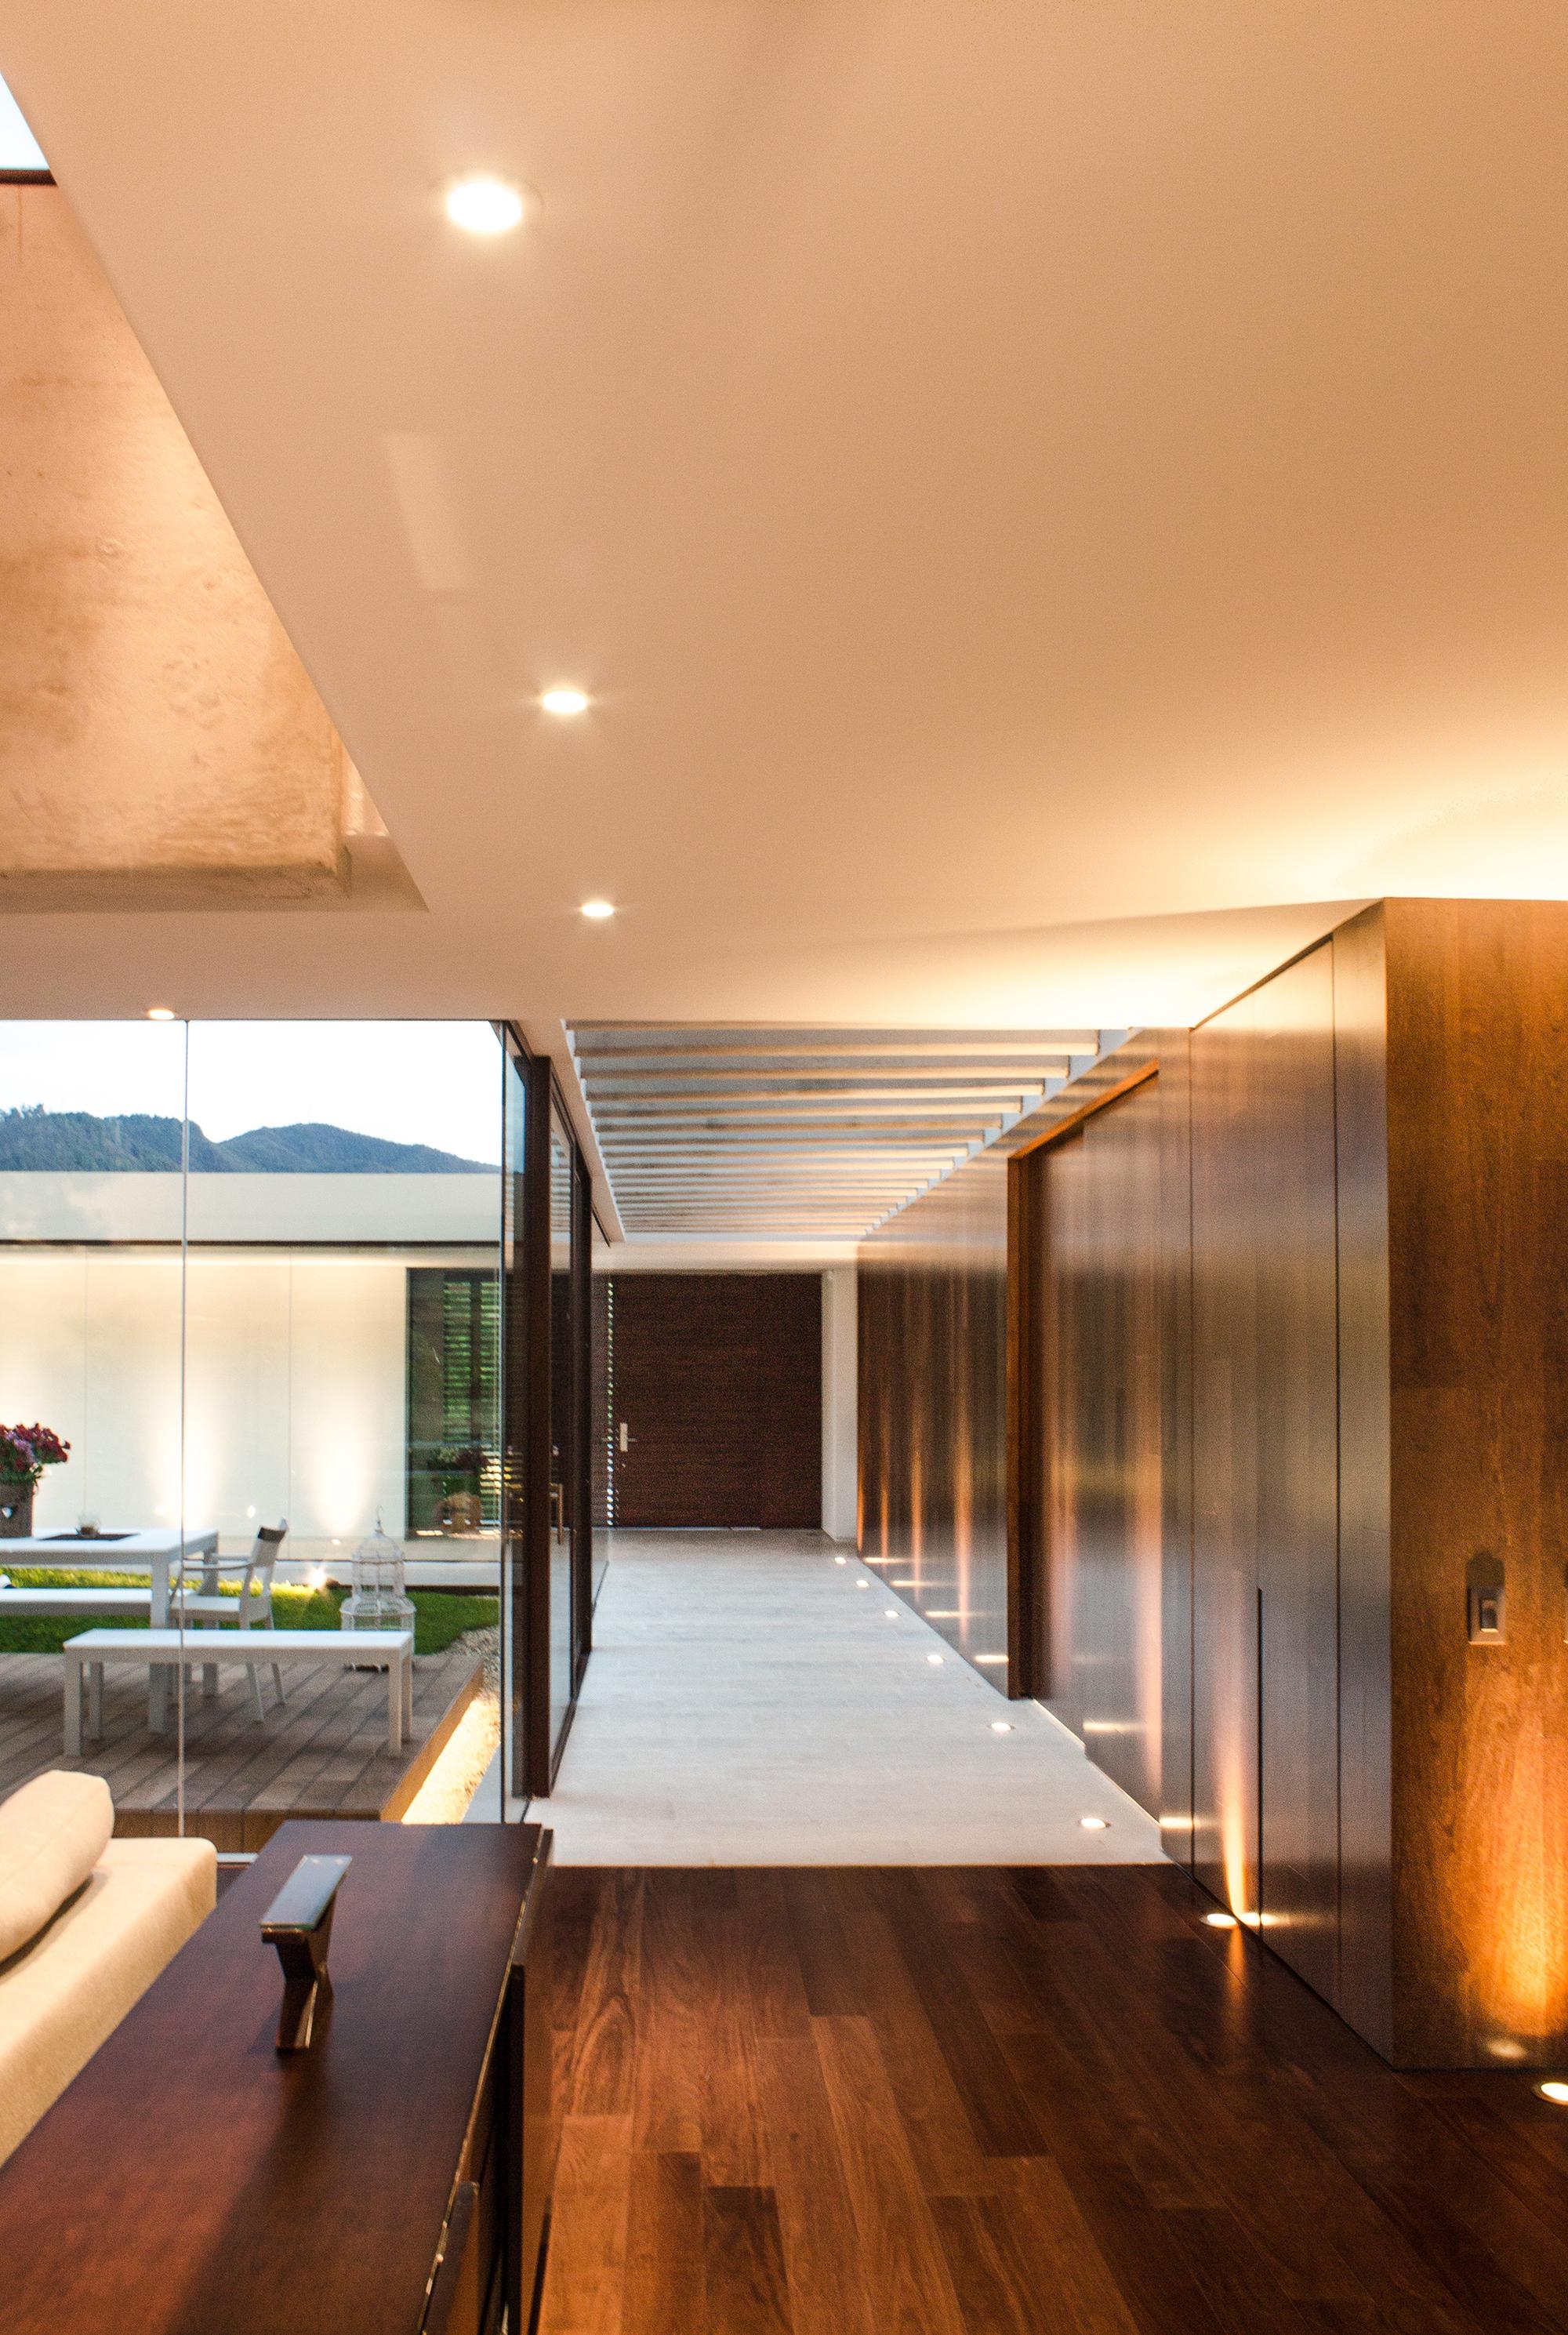 Gallery of casa 5 arquitectura en estudio 7 for Casa estudio arquitectura